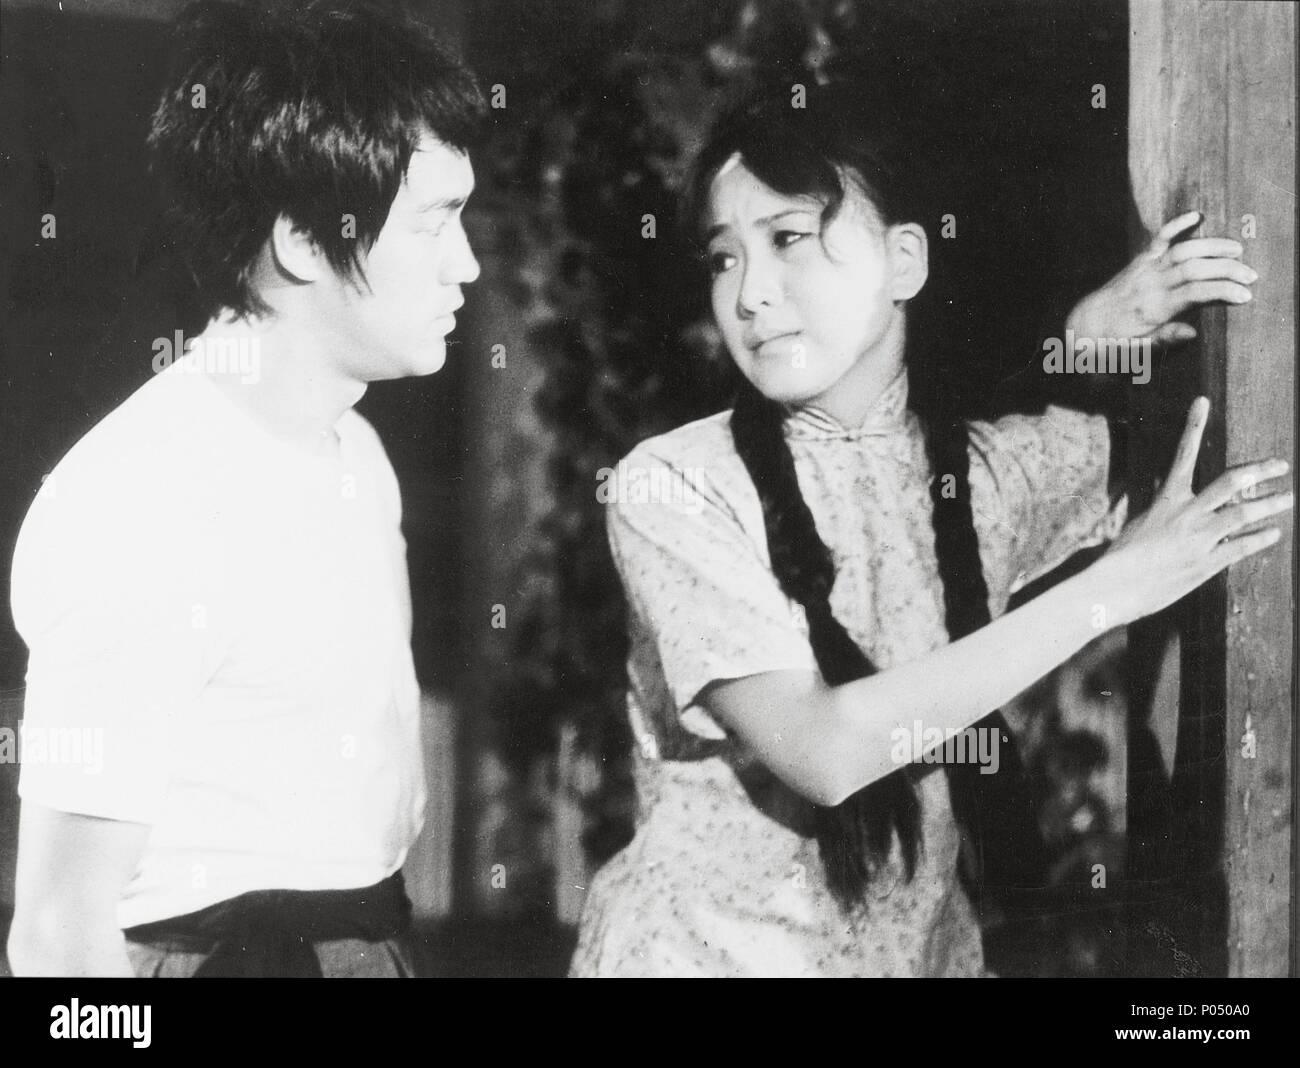 Original Film Title: TANG SHAN DA XIONG. English Title: THE BIG BOSS. Film Director: WEI LO. Year: 1971. Stars: BRUCE LEE; MARIA YI. Credit: 20TH ...